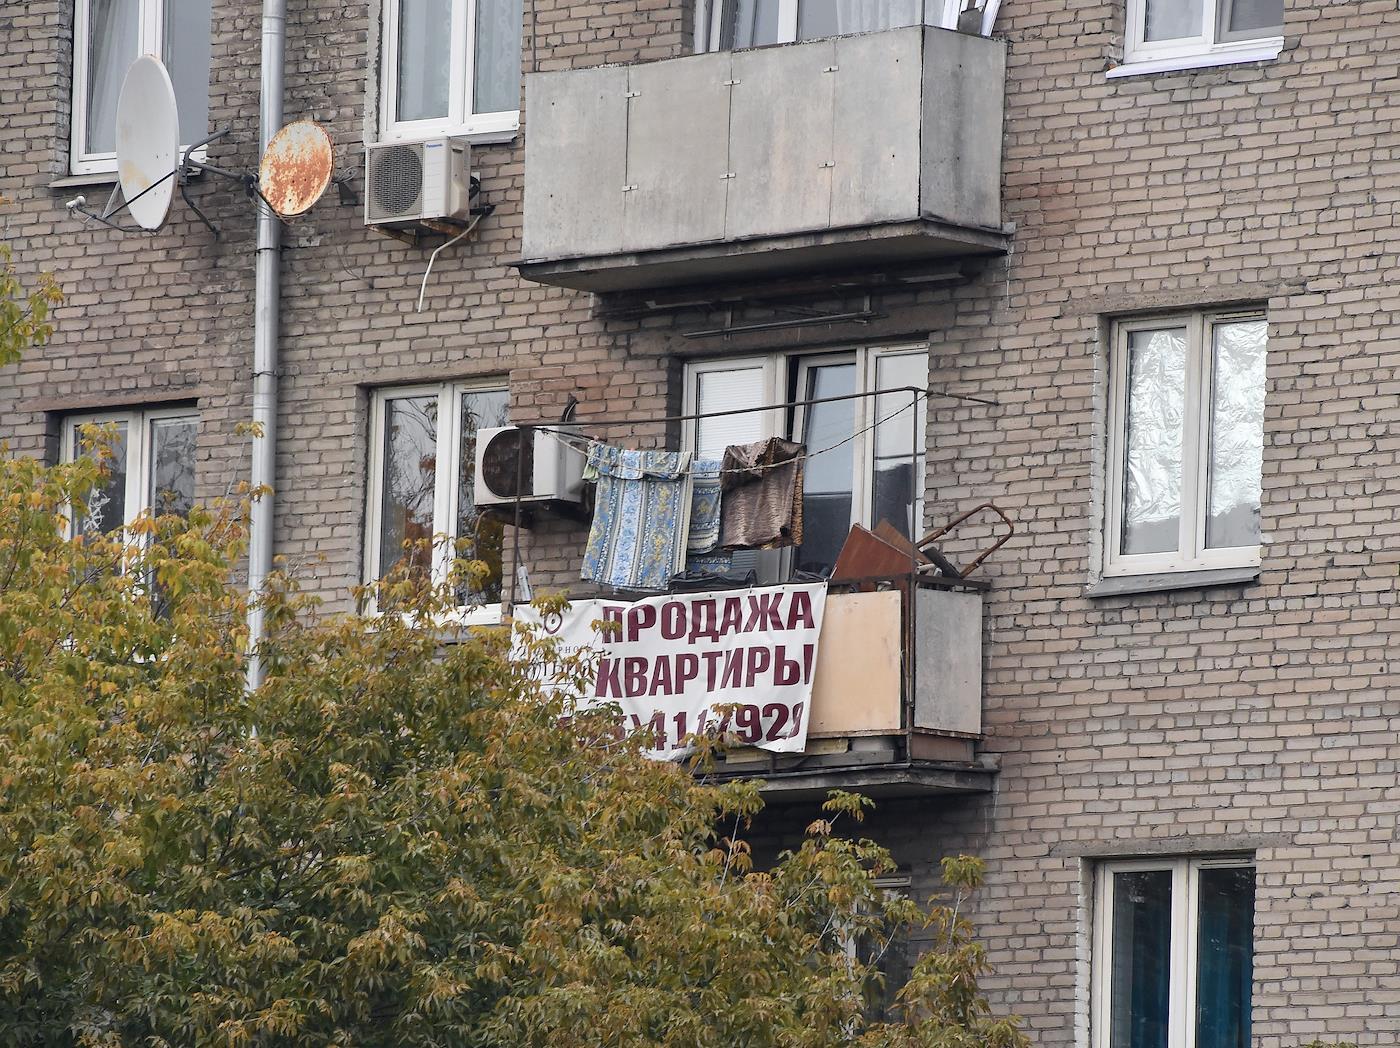 автор фото Анатолий Жданов/Коммерсантъ